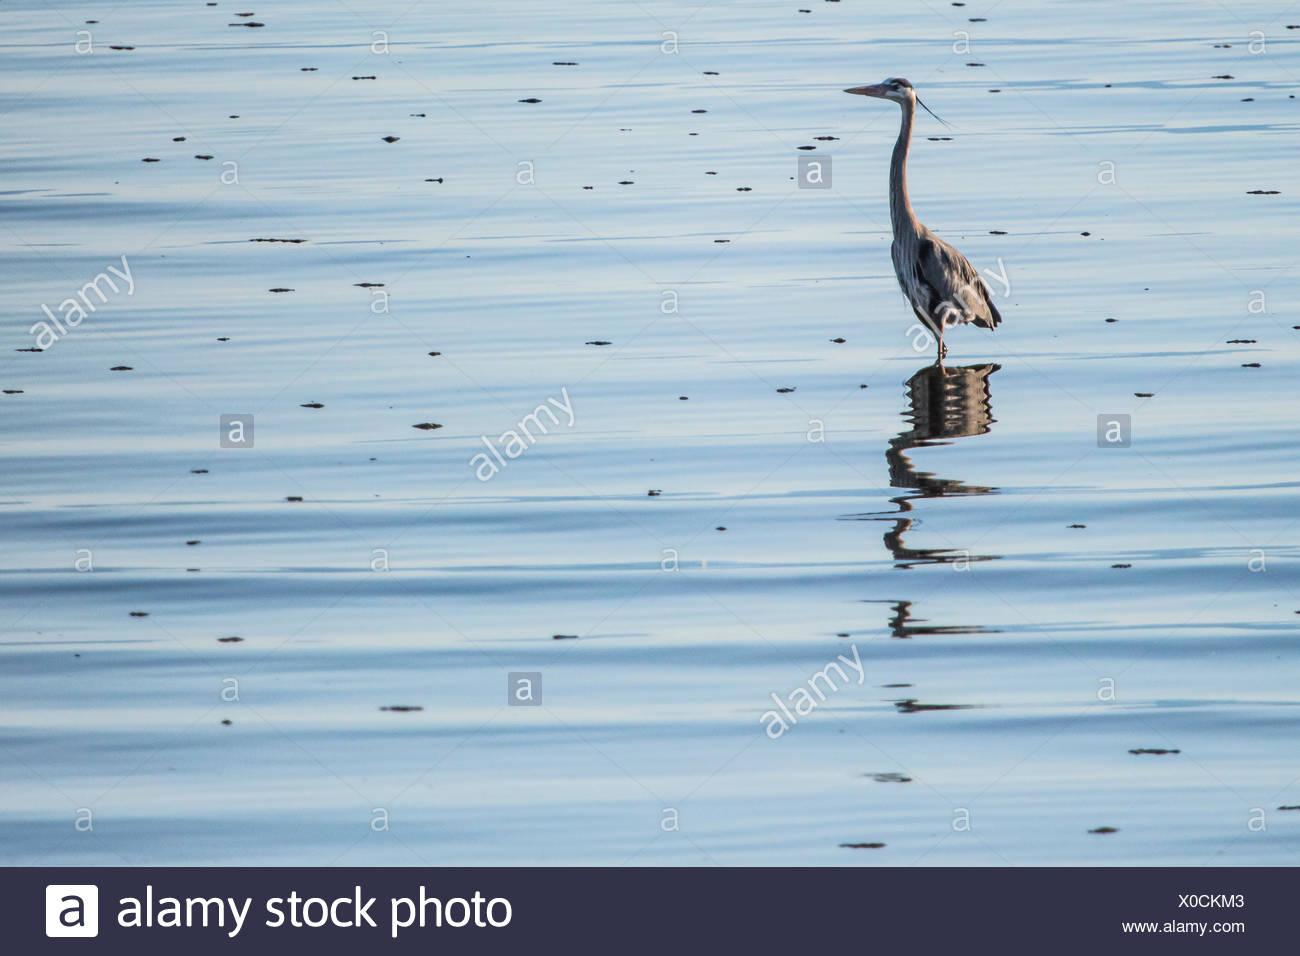 A Great Blue Heron, Ardea herodias, in the shallows in the Salton Sea in Southern California. Stock Photo